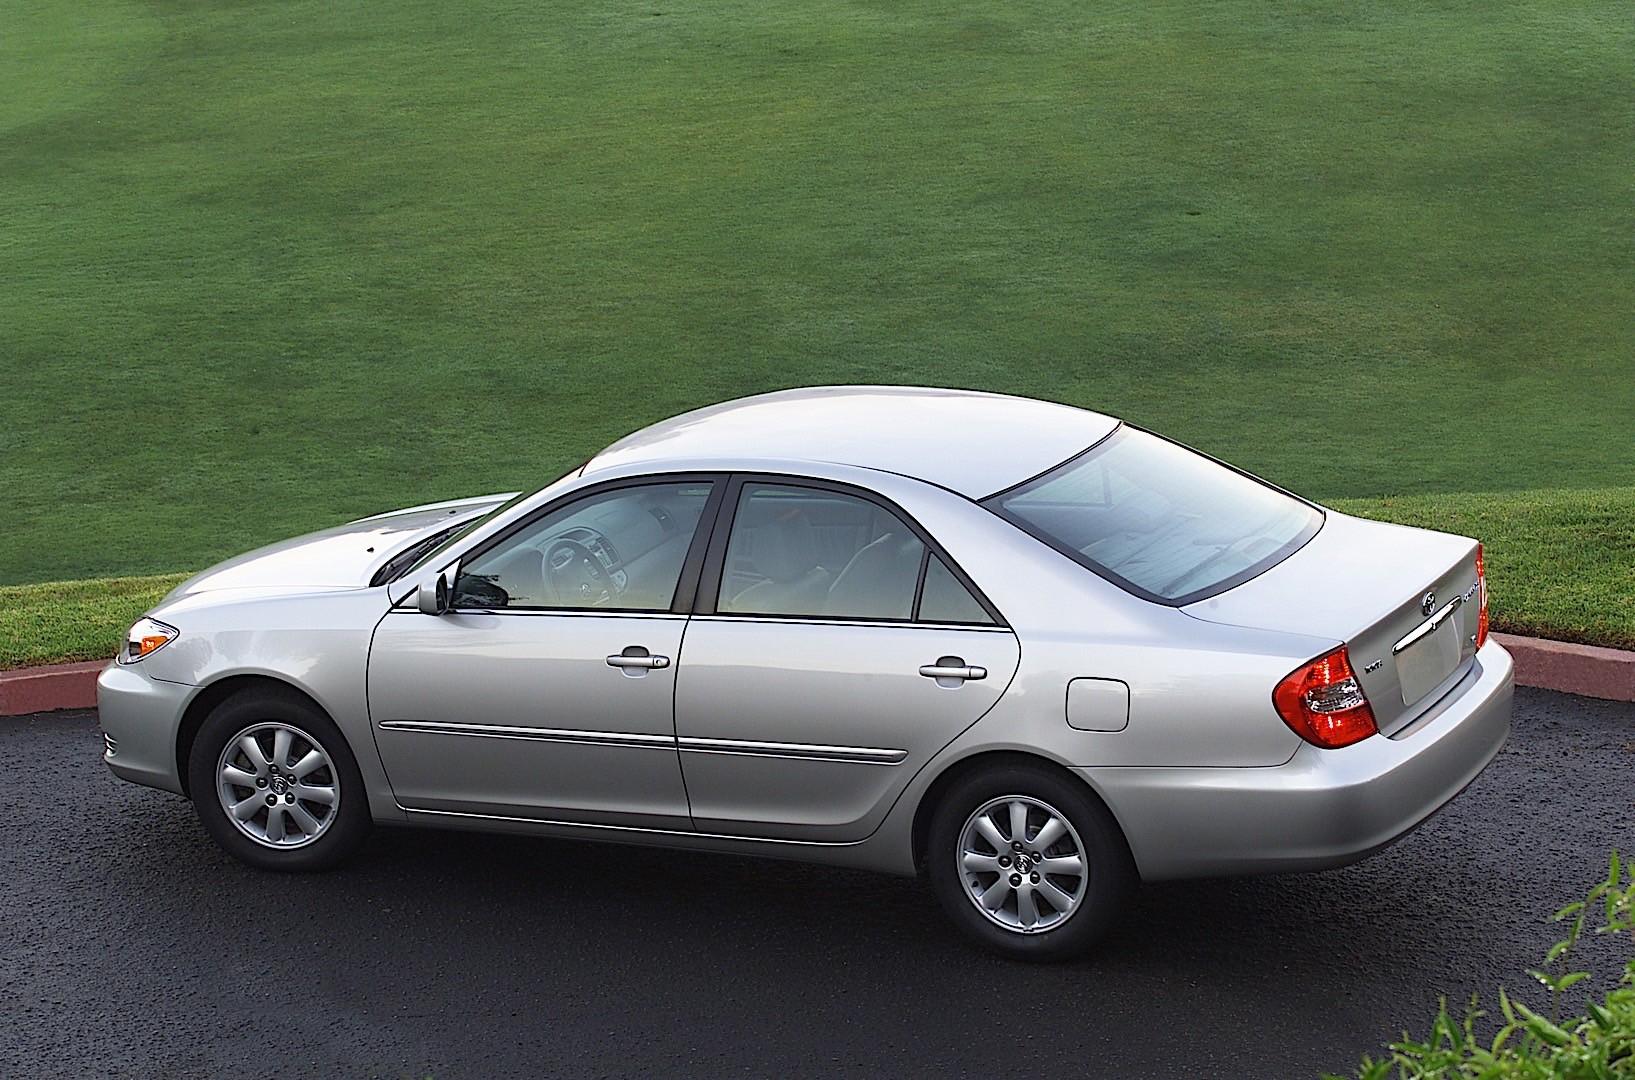 2003 Toyota Corolla Horsepower >> TOYOTA Camry specs & photos - 2001, 2002, 2003, 2004 - autoevolution